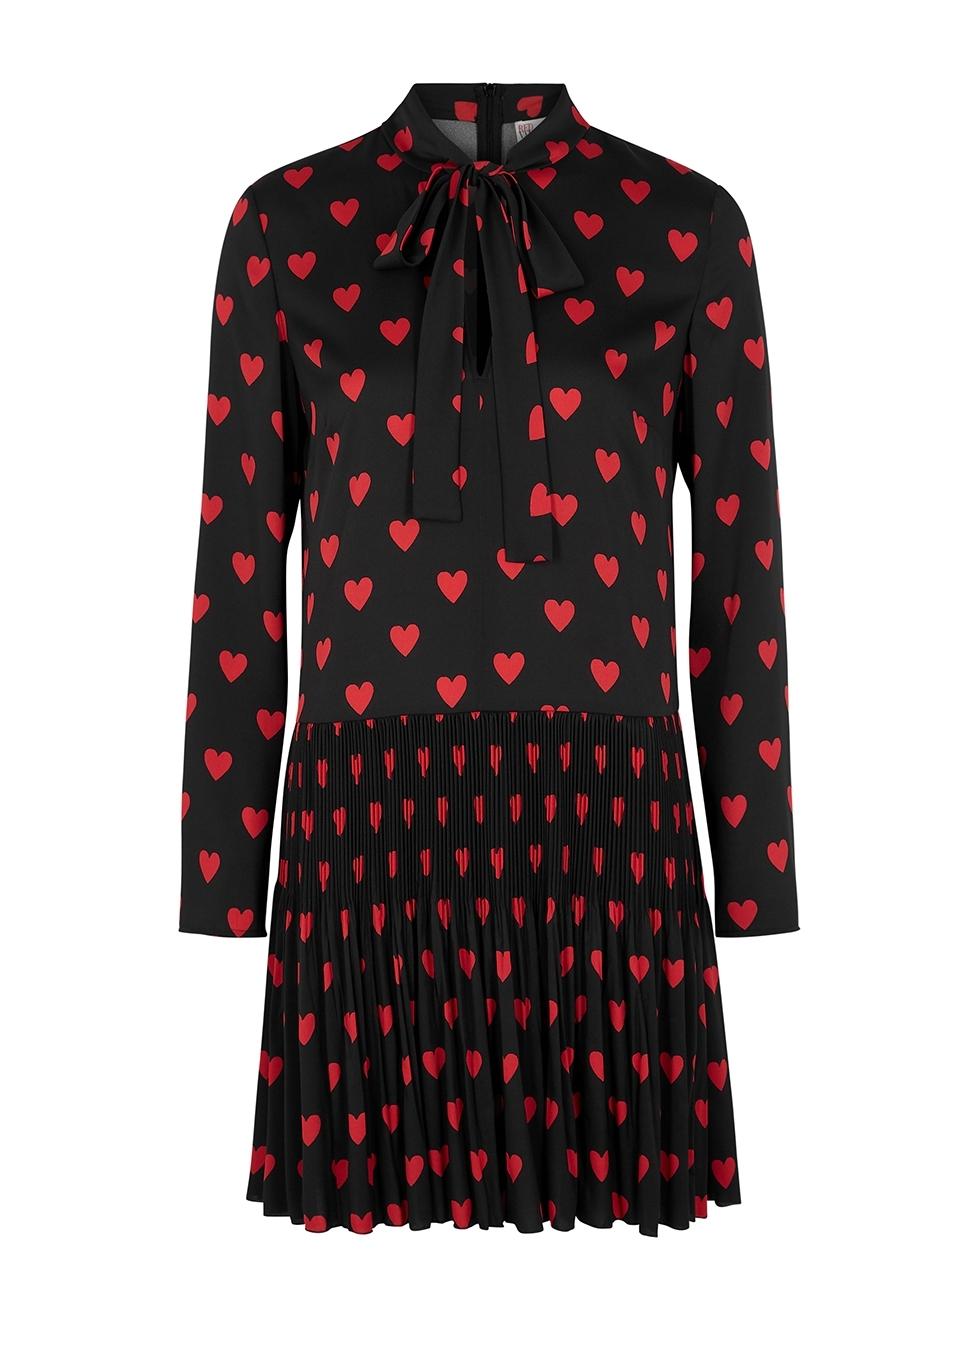 ccfca1f7717f7d RED Valentino Dresses, Shoes, Skirts, Tops - Harvey Nichols